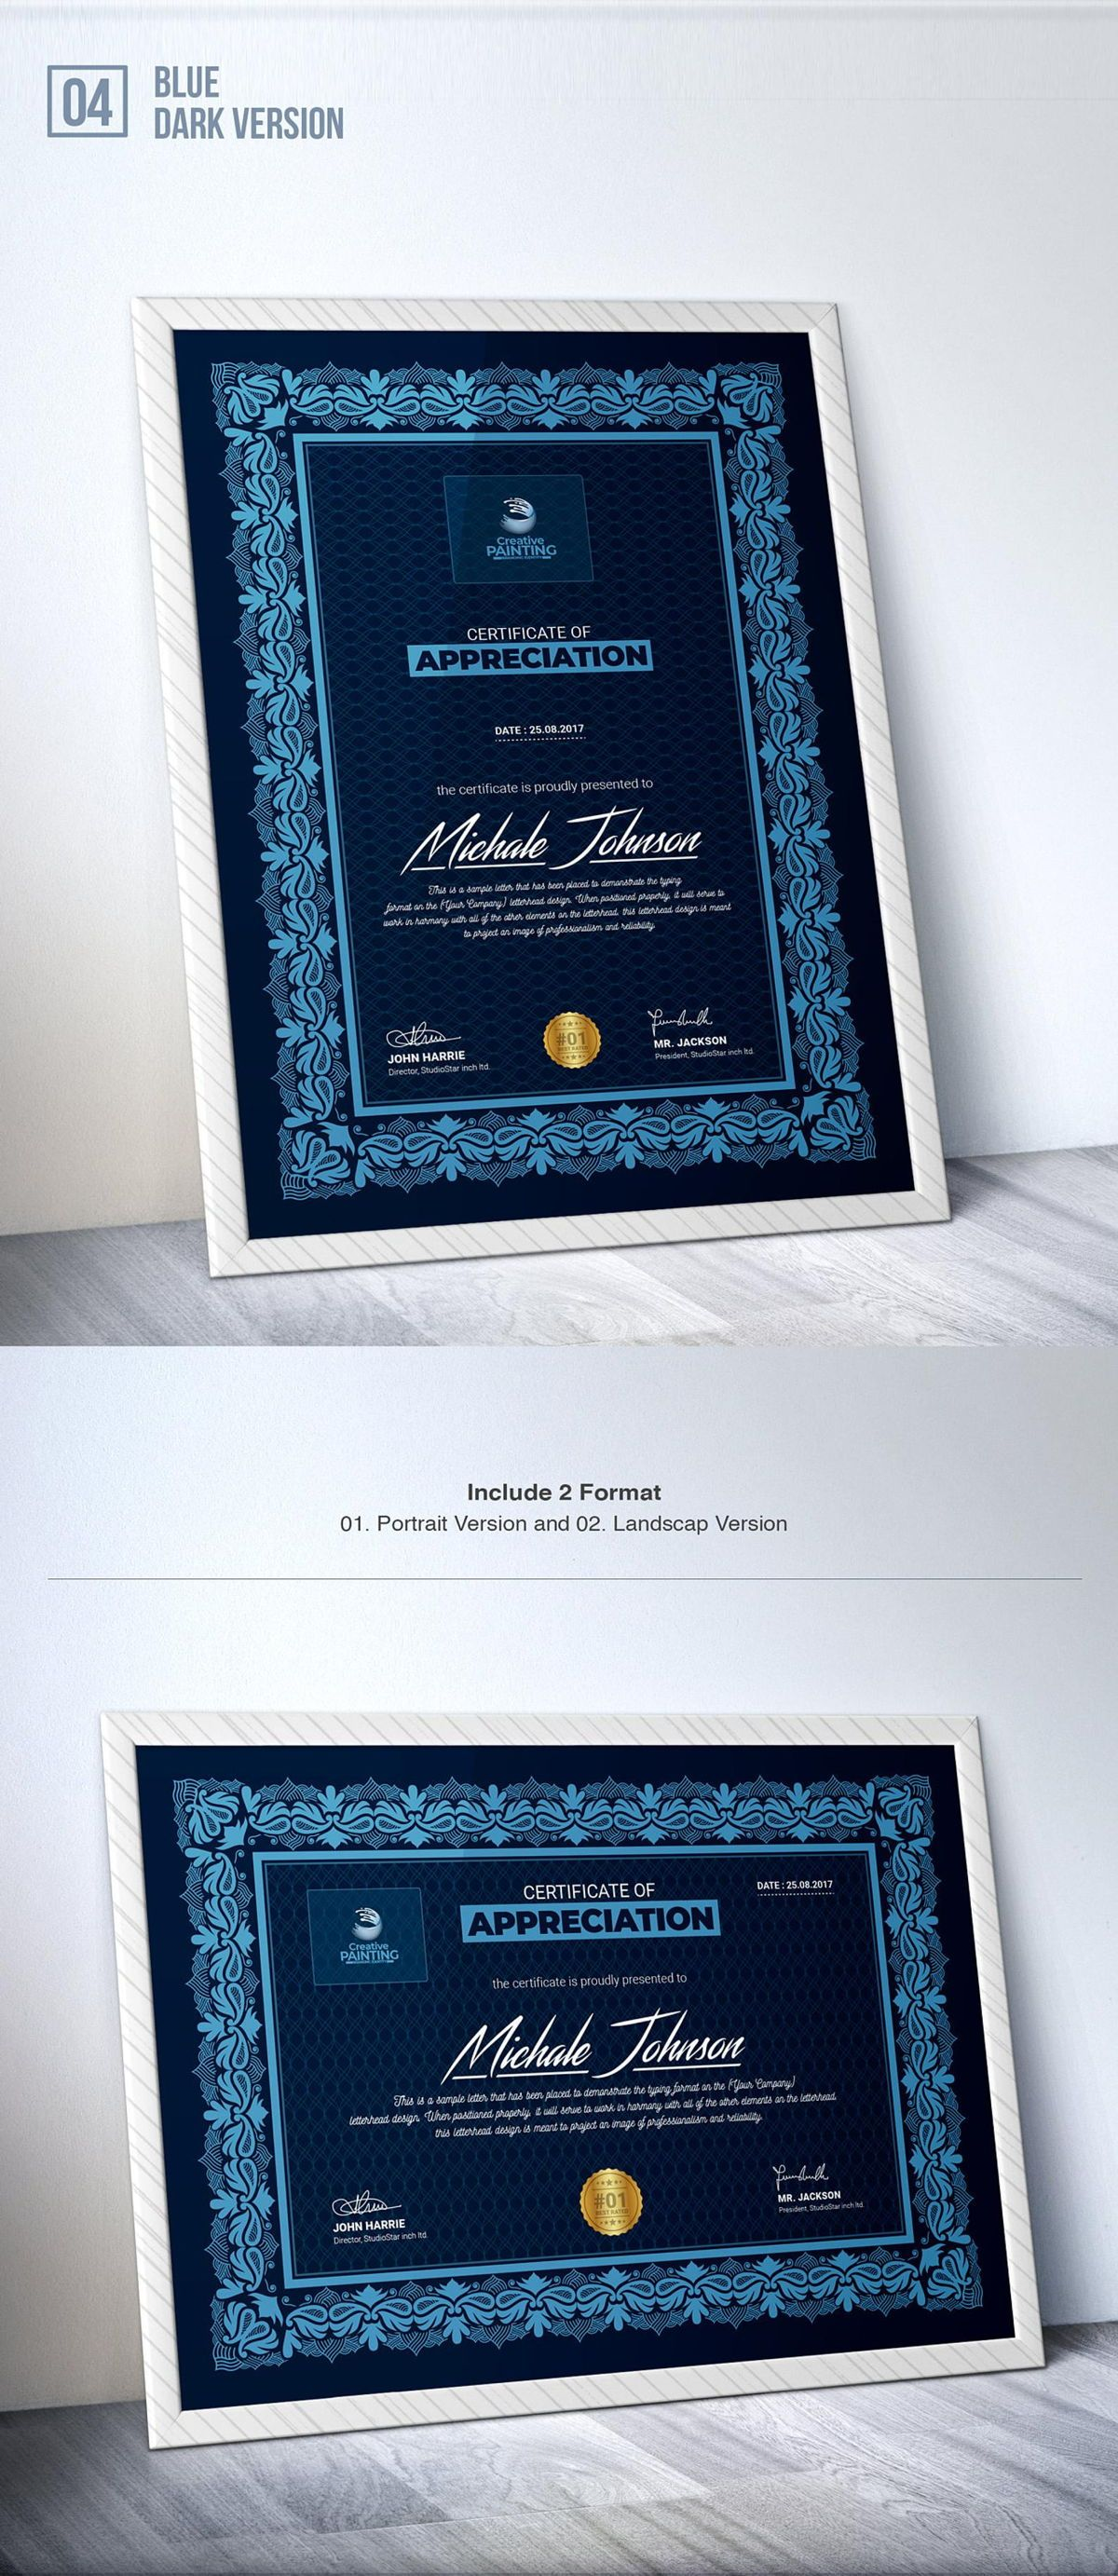 Creative Painting Certificate - 8 Colors - Dark and Light Version, Slide 6, 08755, Business — PoweredTemplate.com